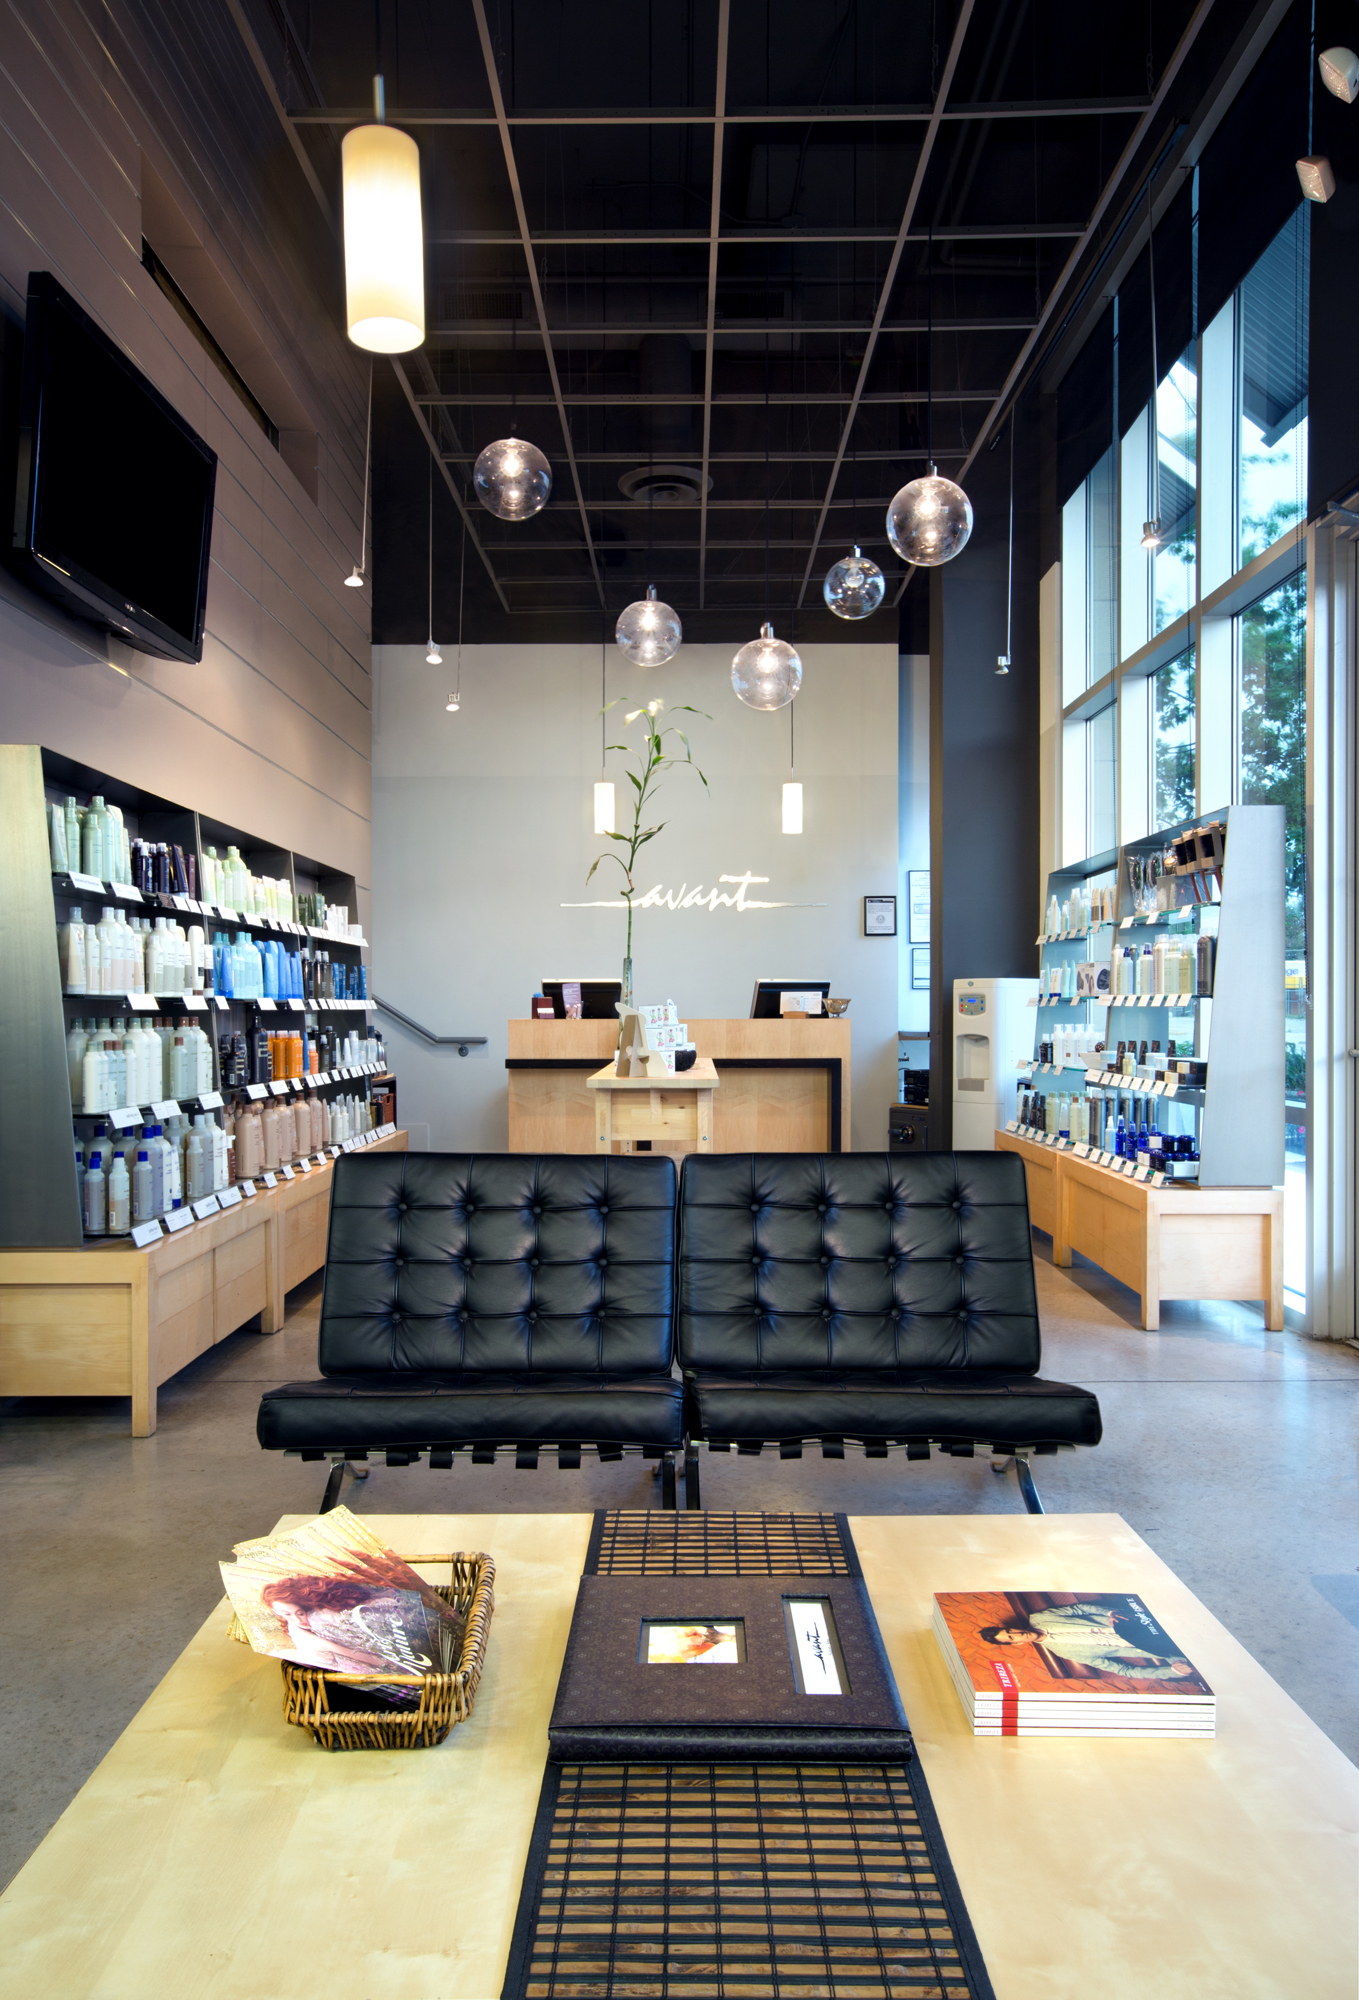 avant-salon-interior-architectural-photographer.jpg